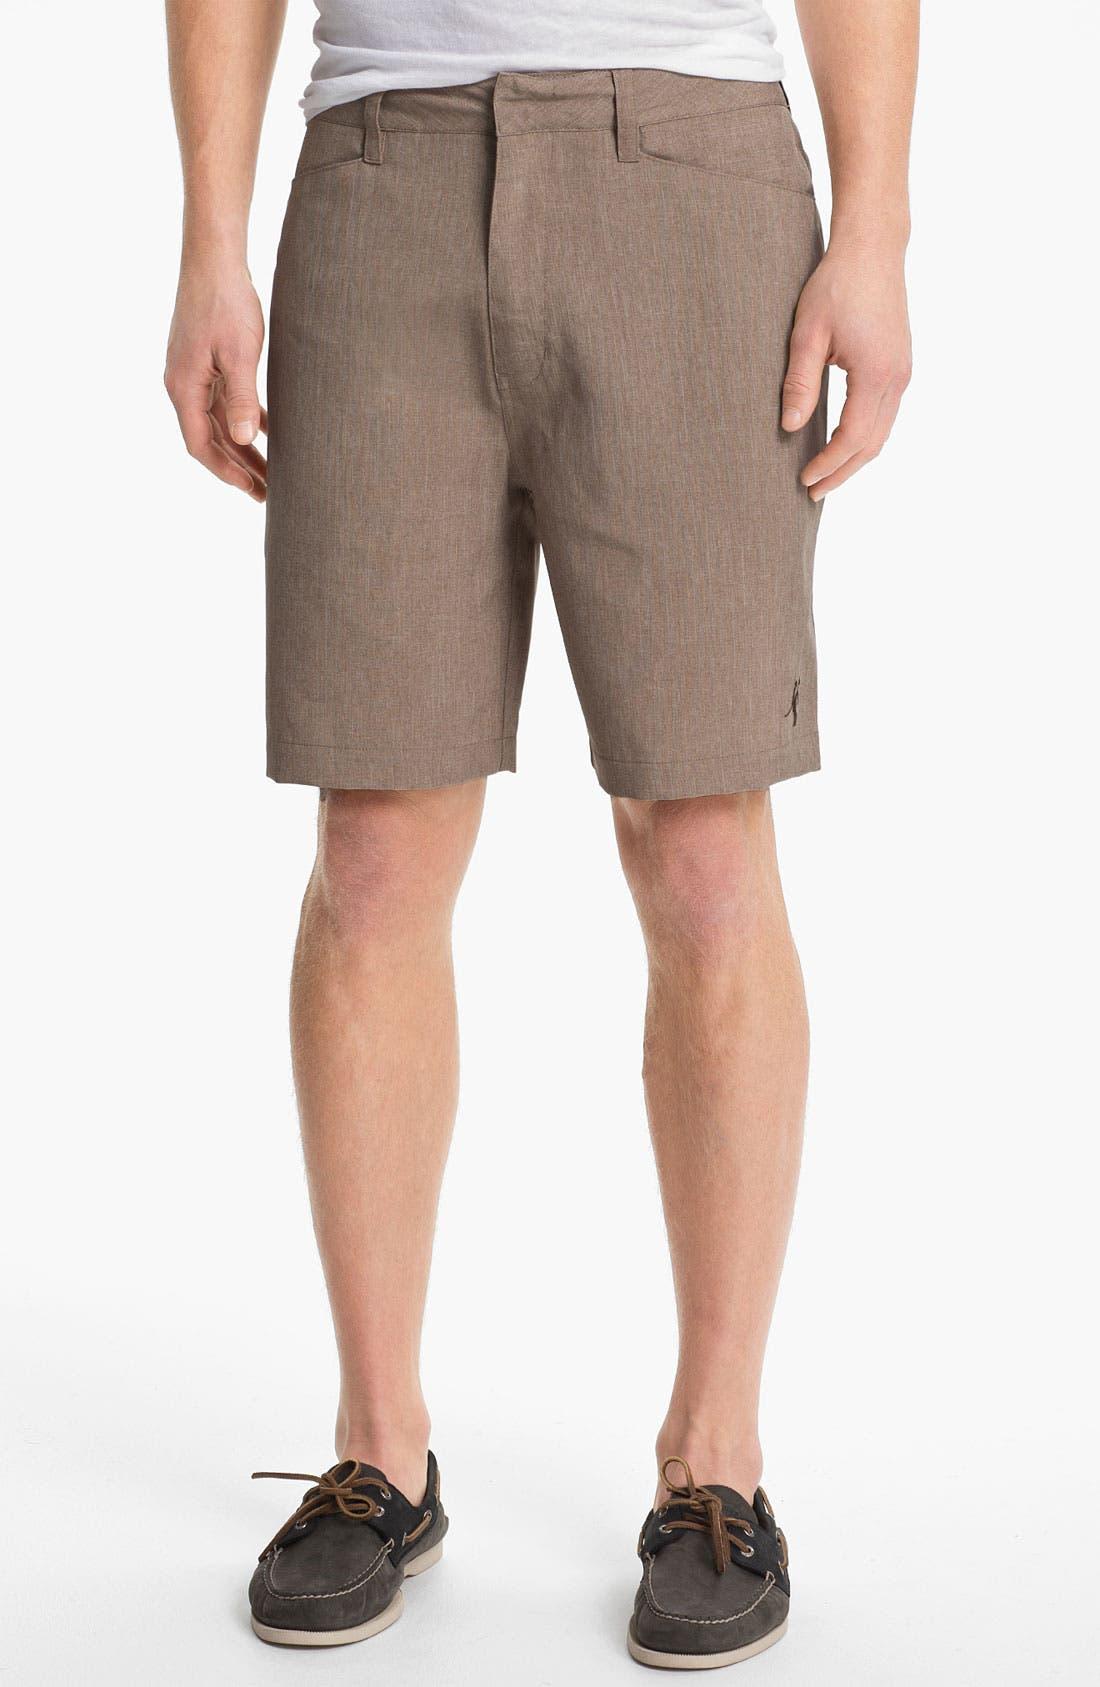 Alternate Image 1 Selected - Toes on the Nose 'Rocker' Khaki Shorts